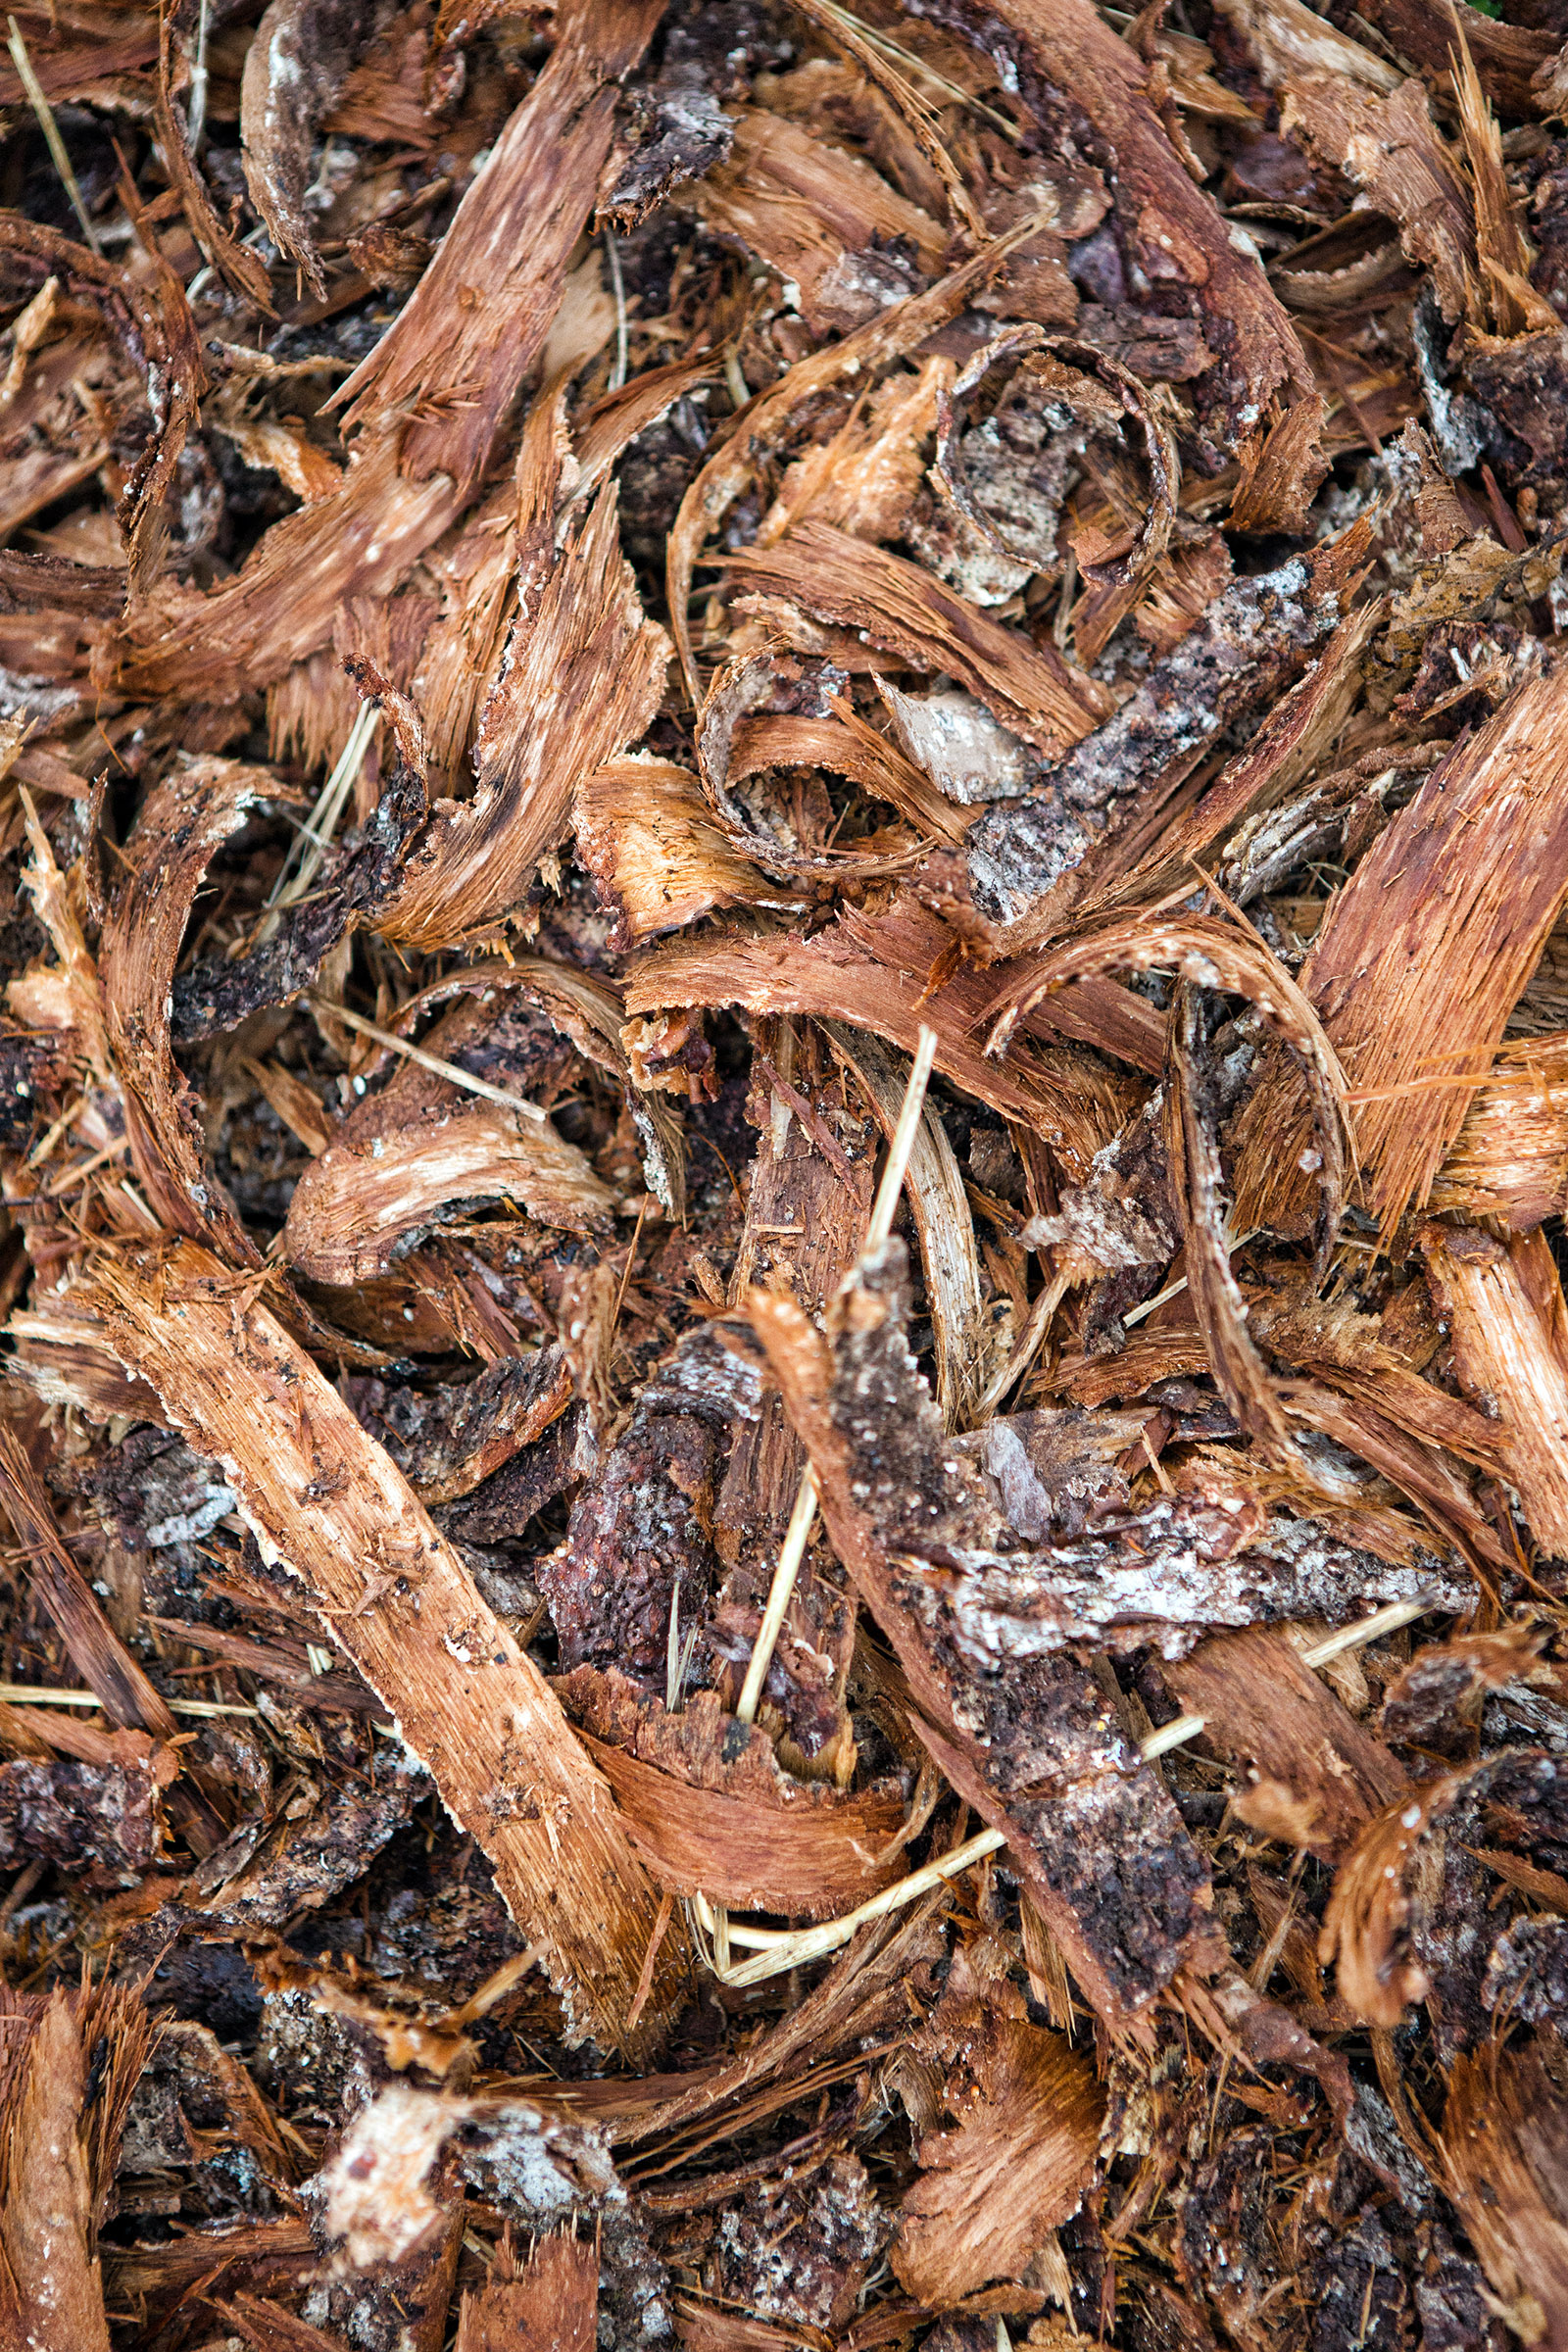 Tree bark, Plant, Random, Shredded, Pine, HQ Photo